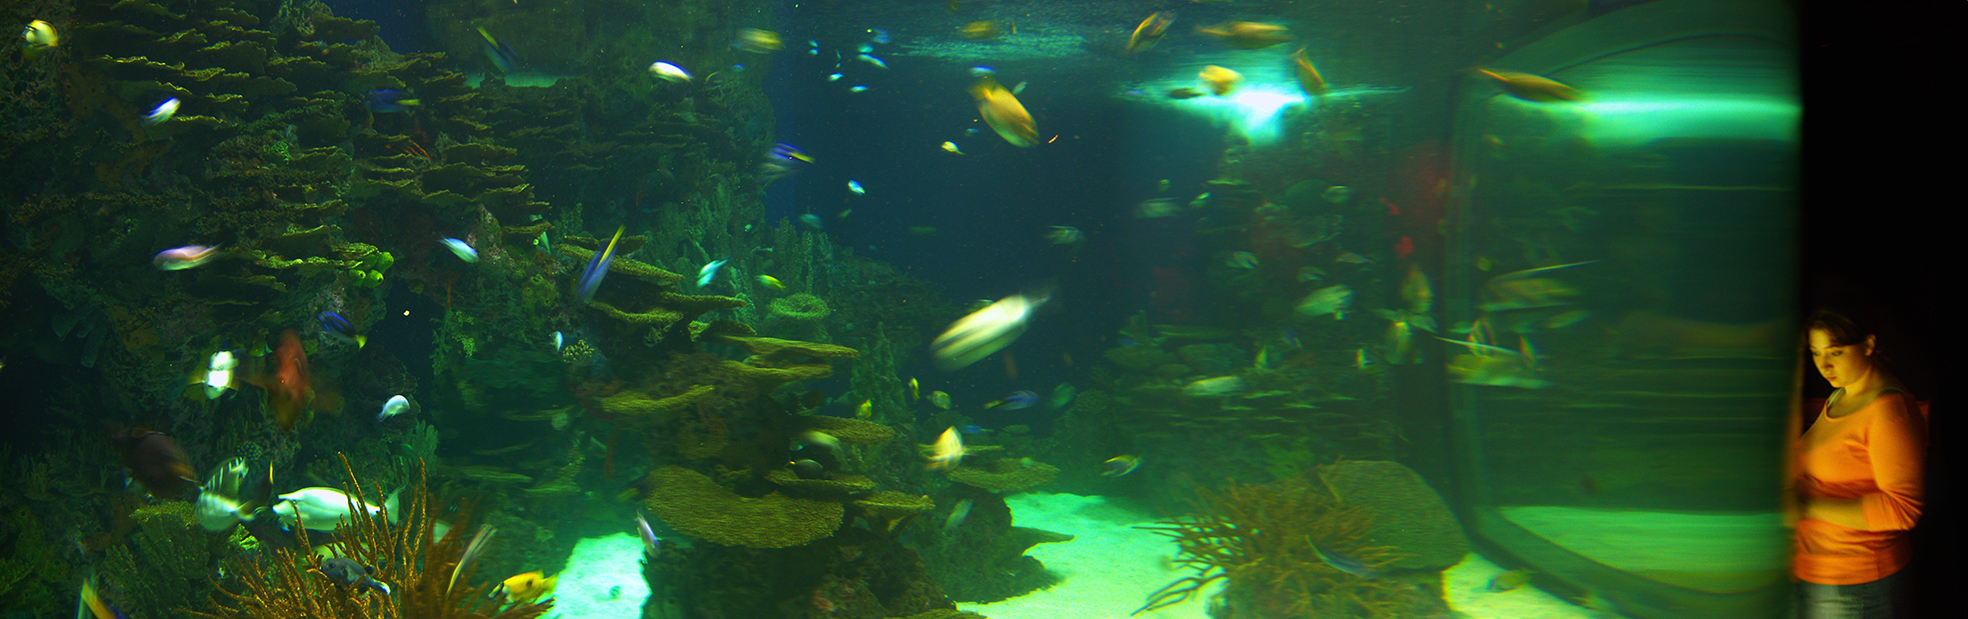 Ripleys Aquarium / Gatlinburg/ Tennessee Explore Dallas120 ...